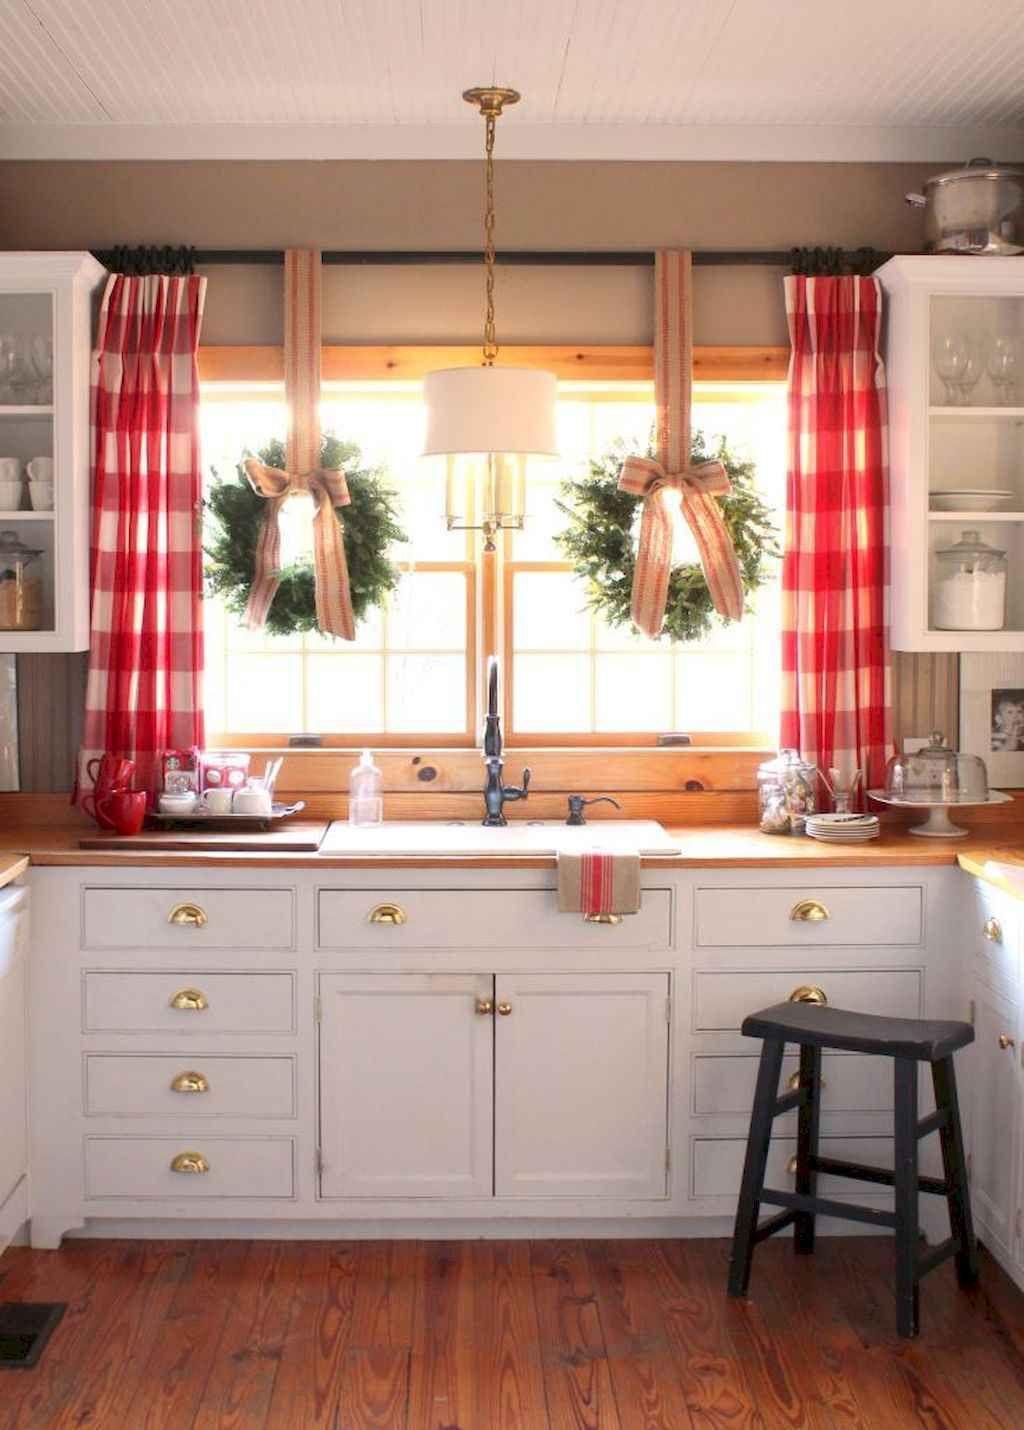 70 pretty farmhouse kitchen curtains decor ideas 33 decor home decor christmas kitchen on farmhouse kitchen valance ideas id=52494